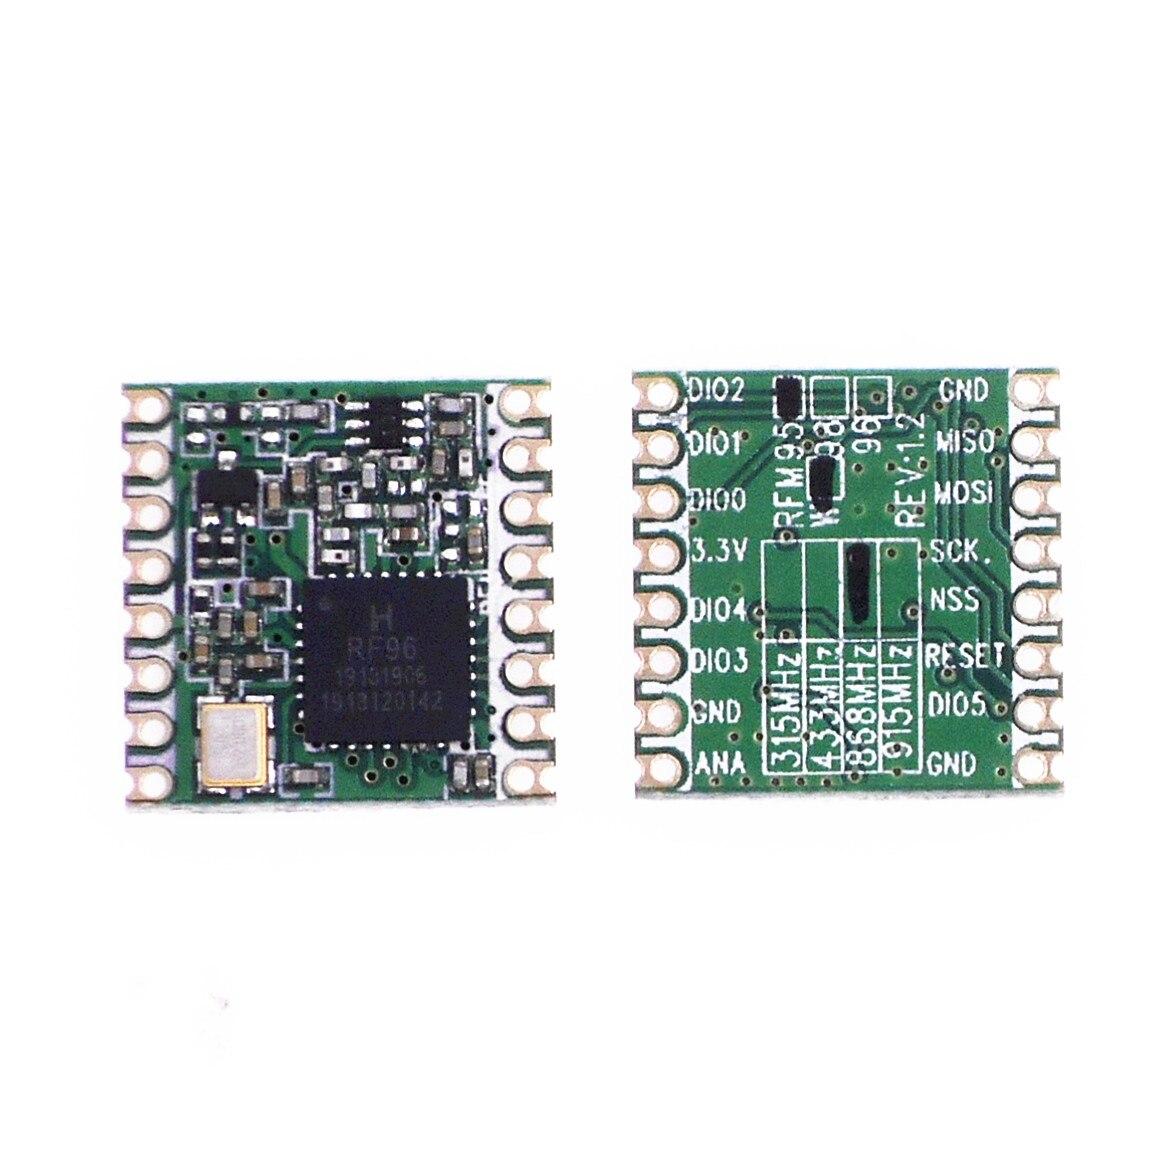 100pcs/lot RFM95 RFM95W 20dBm 100mW 868Mhz 915Mhz DSSS